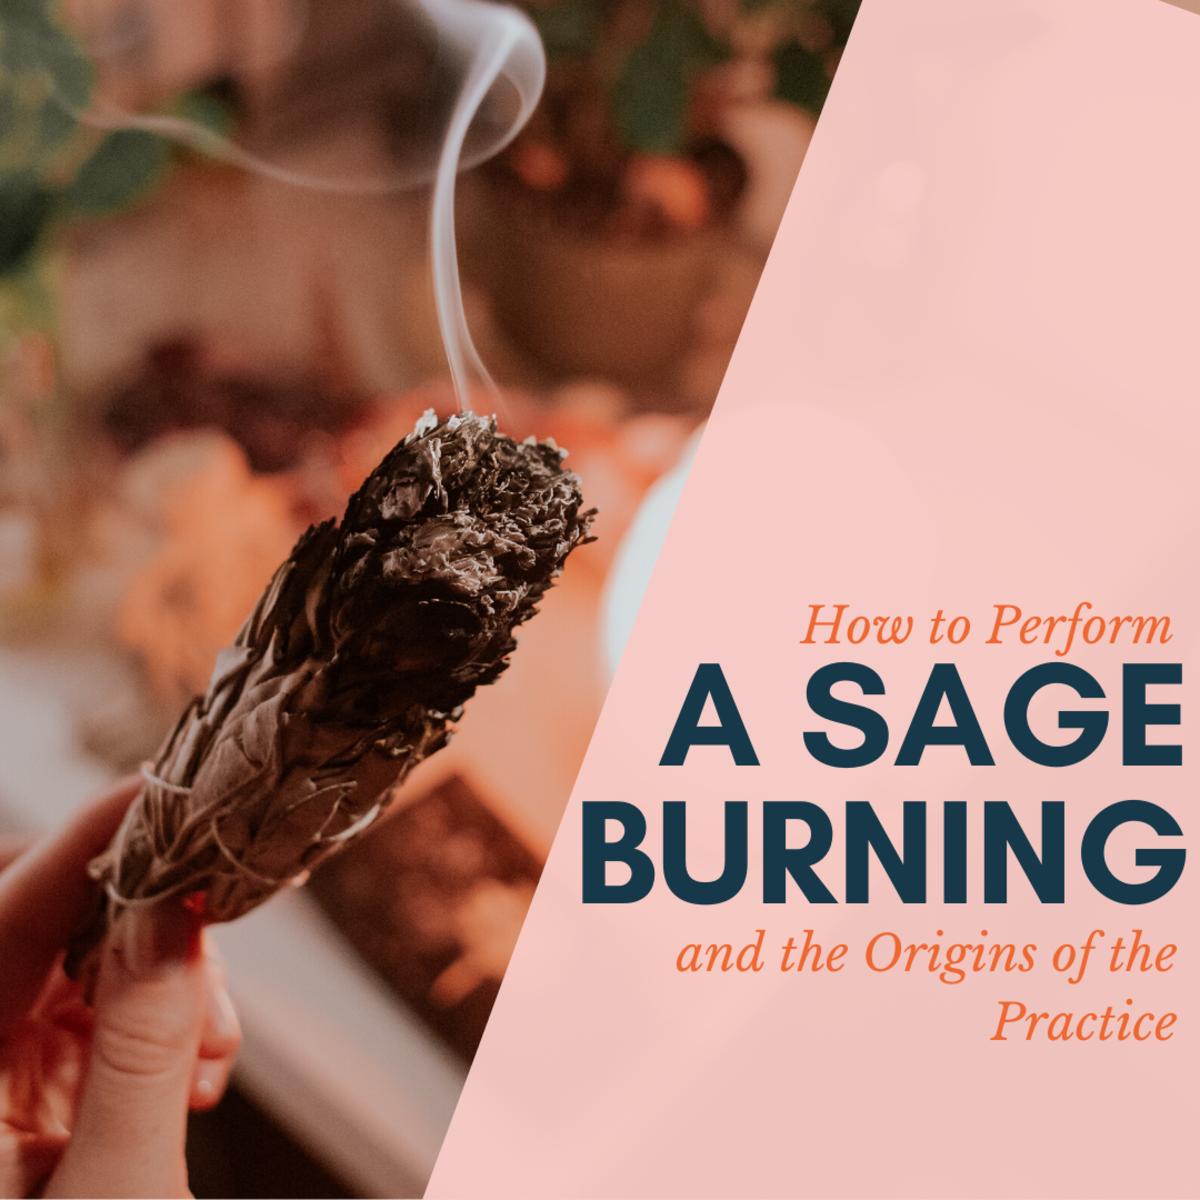 How to Burn Sage